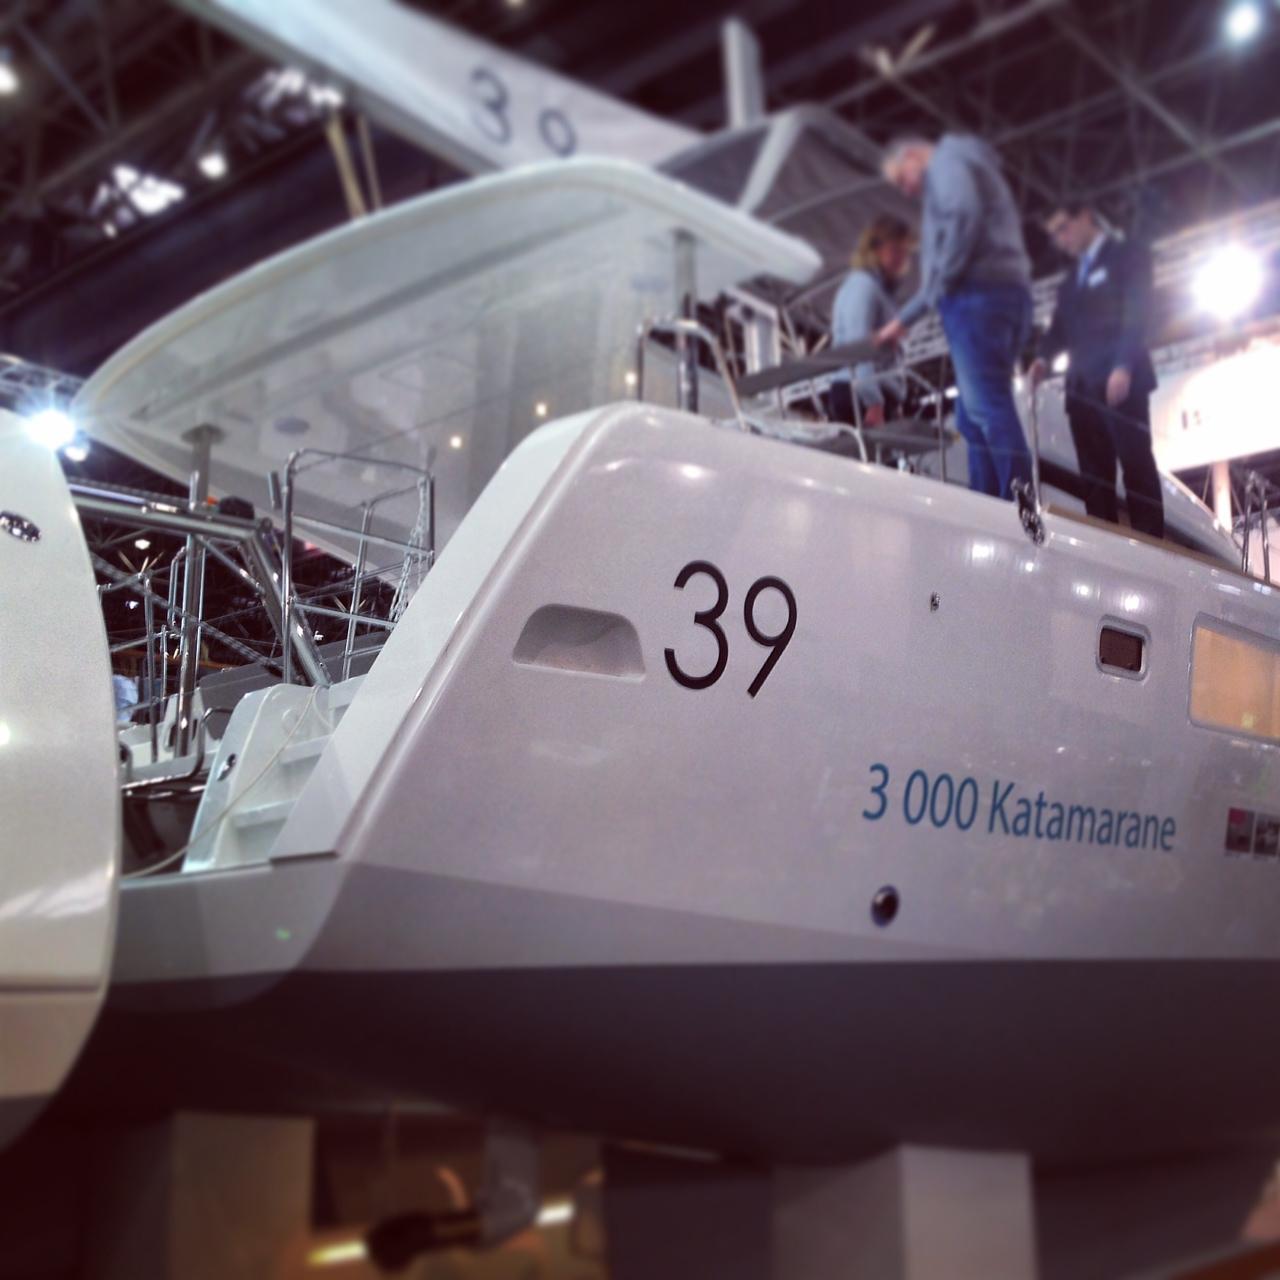 Lagoon 39, le catamaran du groupe Beneteau